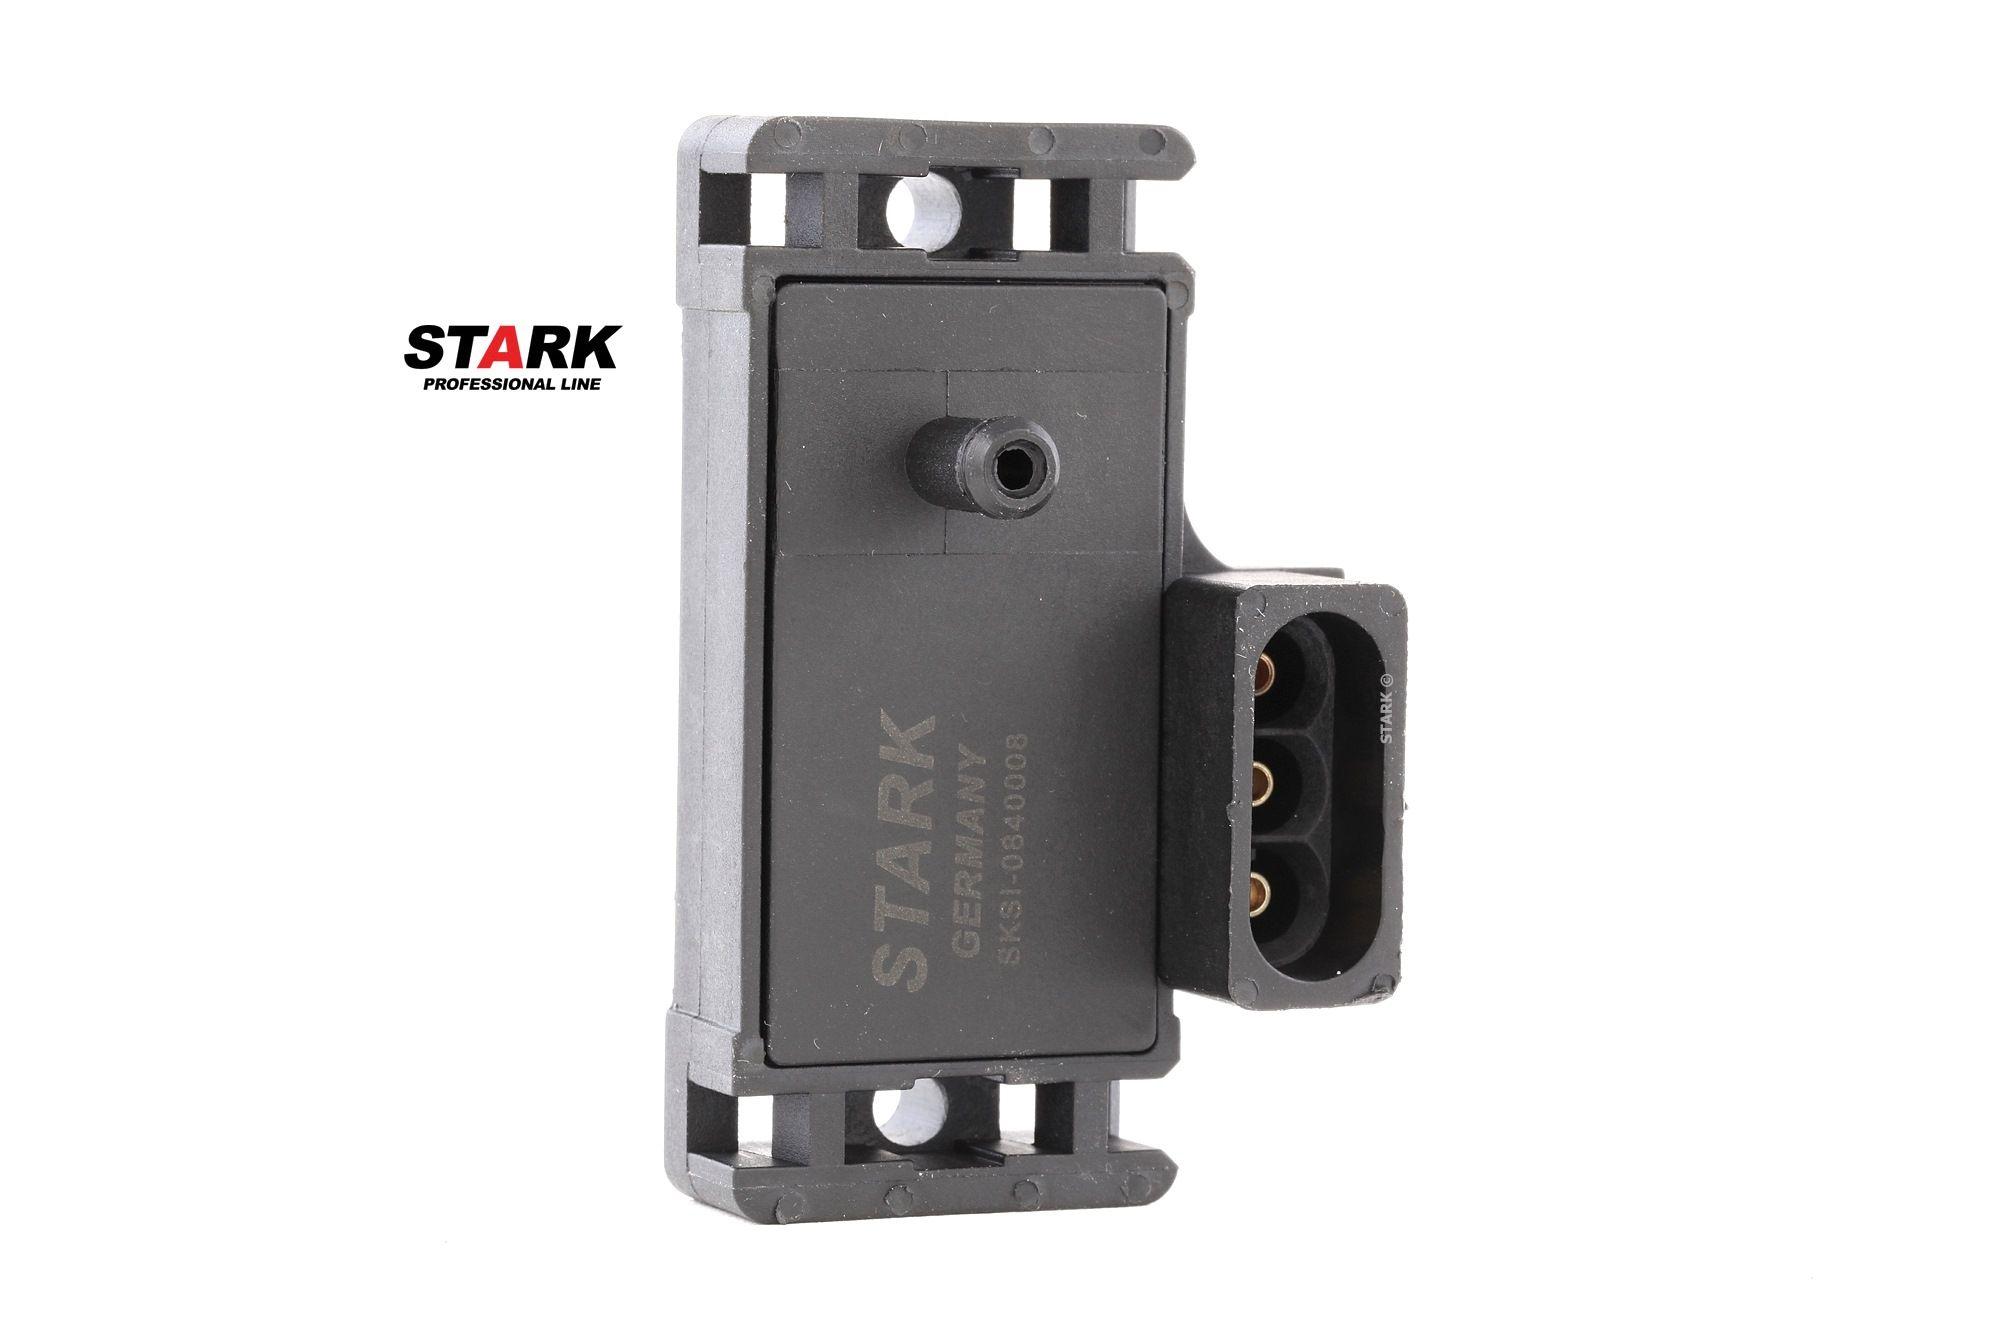 OPEL CORSA 2015 Sensor, Saugrohrdruck - Original STARK SKSI-0840008 Anschlussanzahl: 3